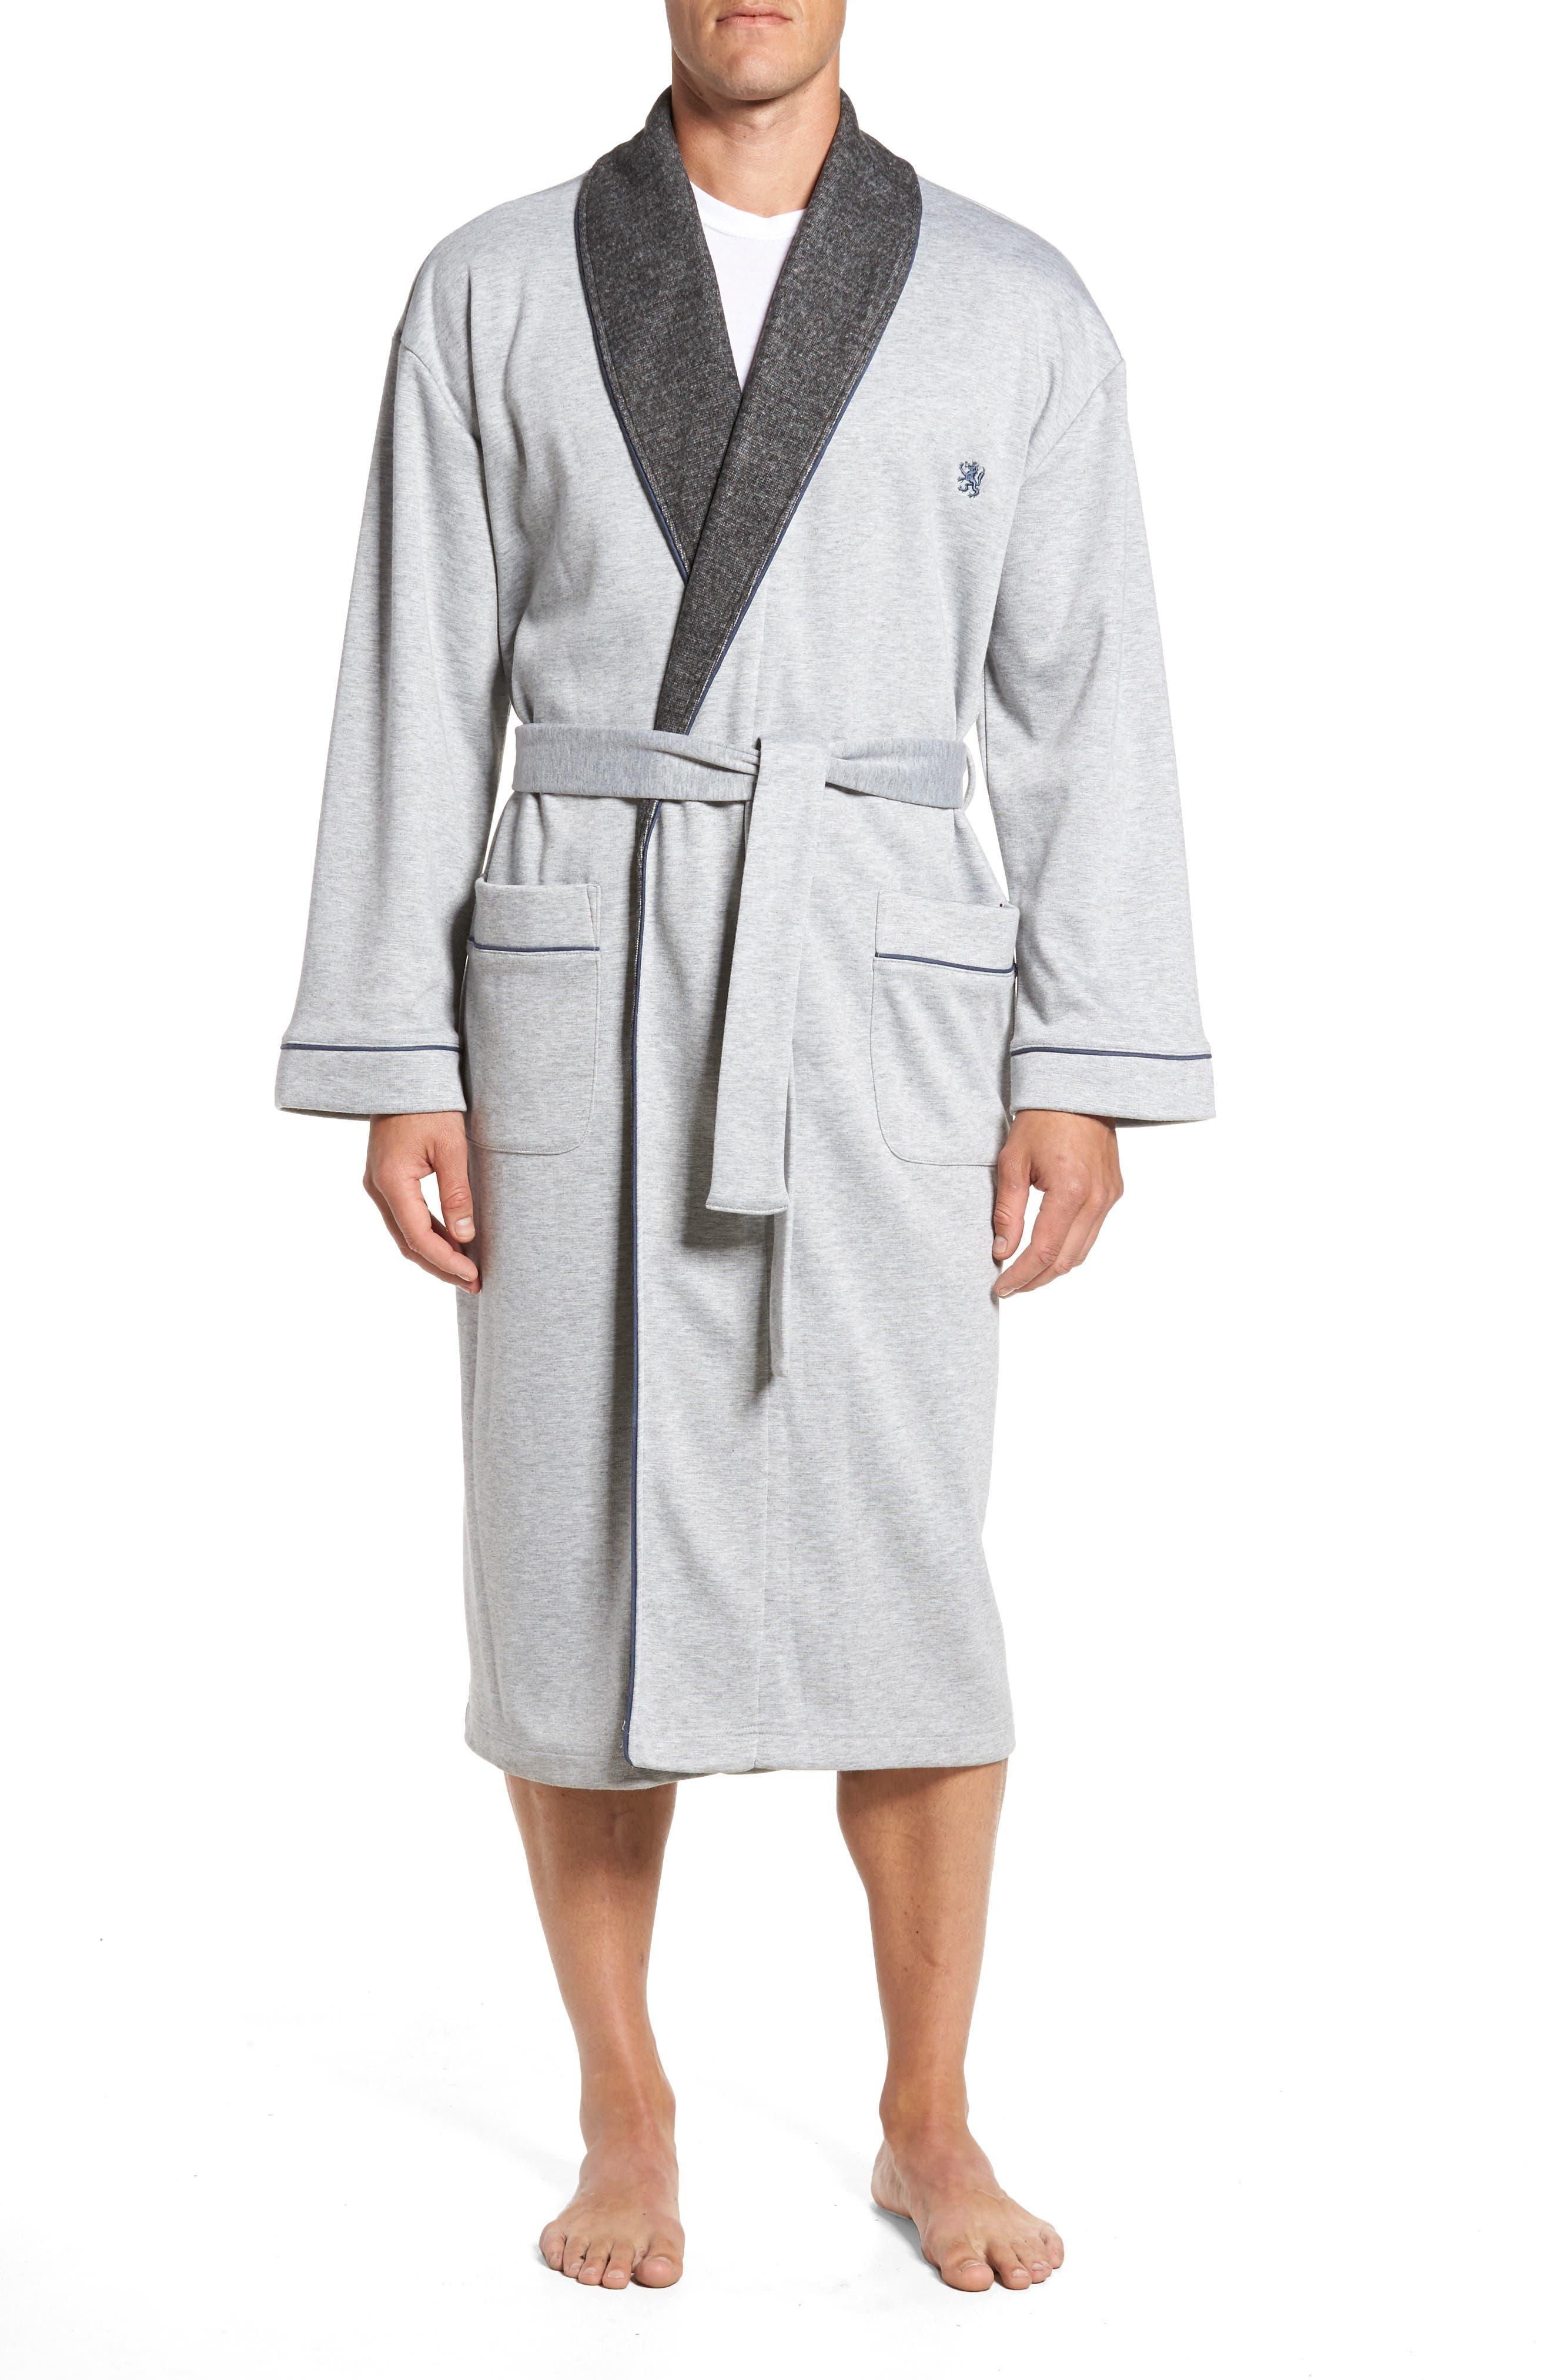 Majestic International Double Take Robe